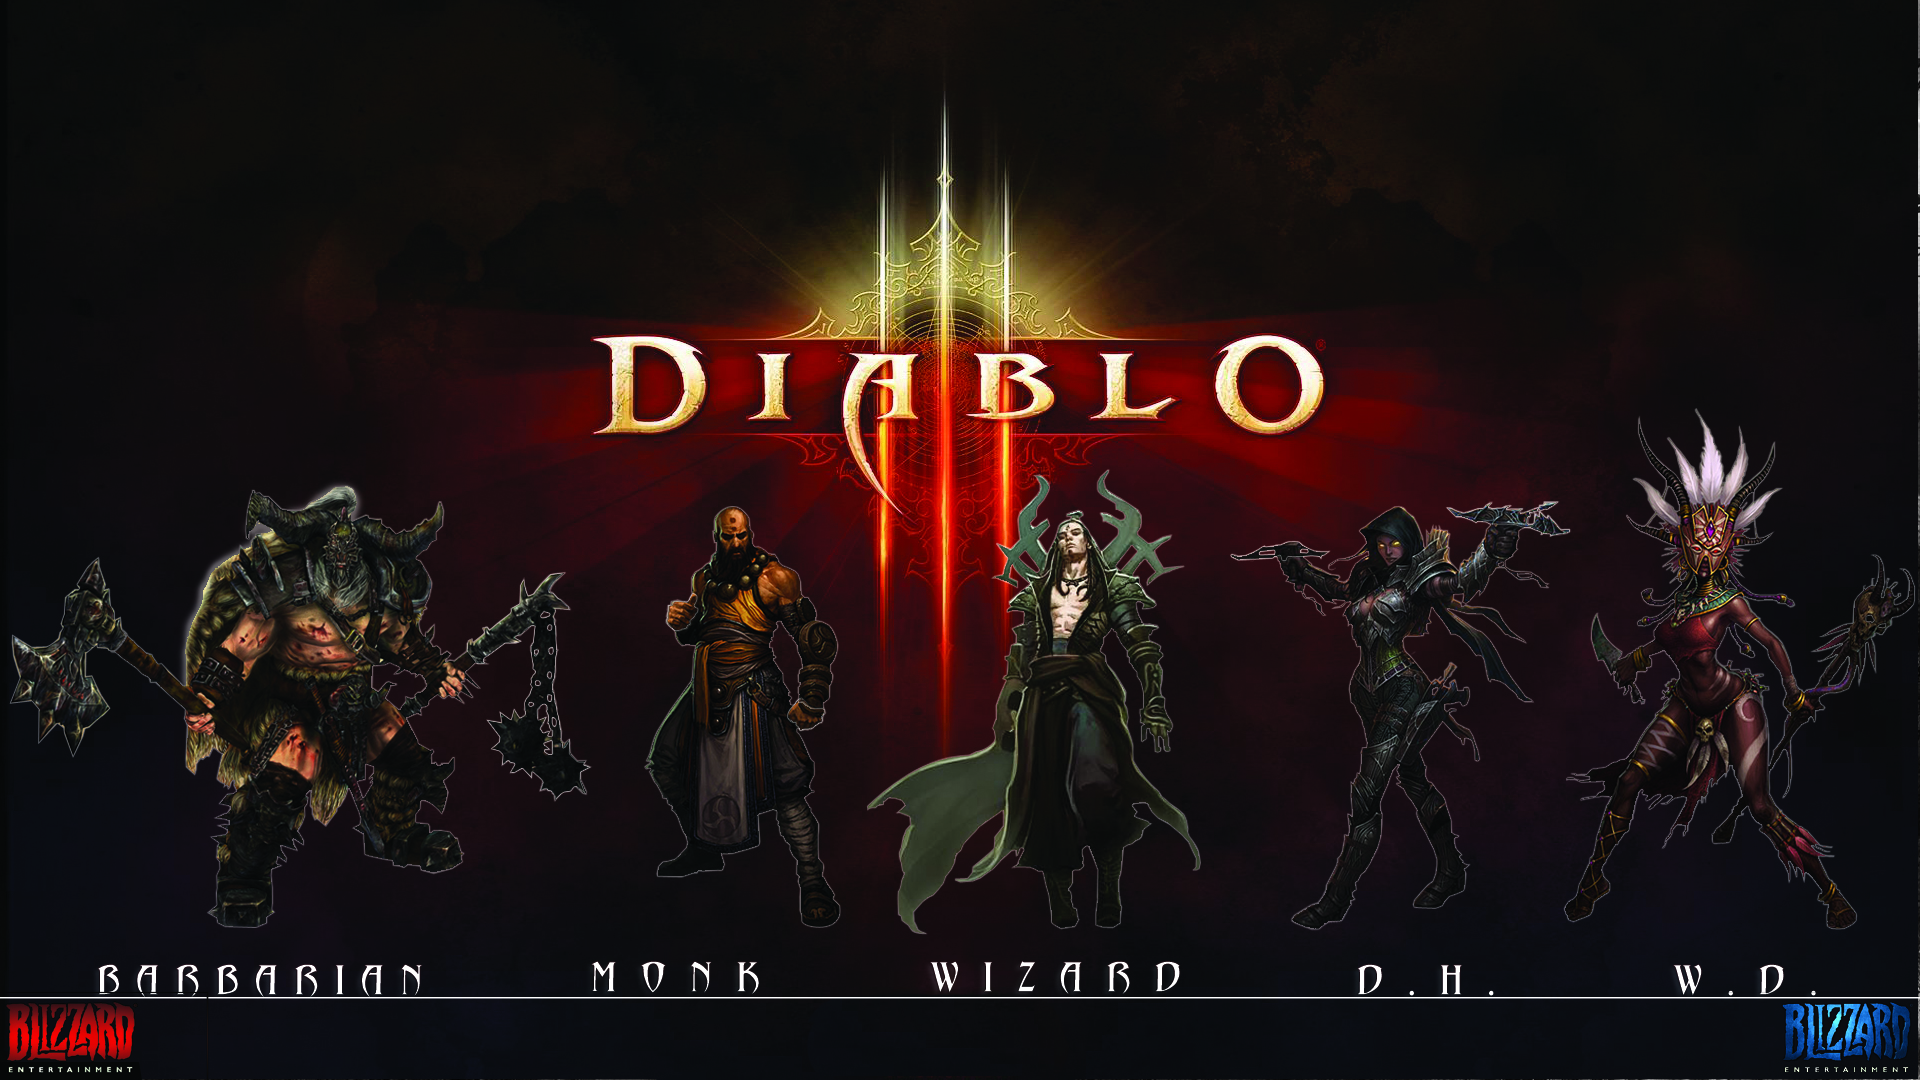 Diablo Iii Hd Backgrounds Pictures Images